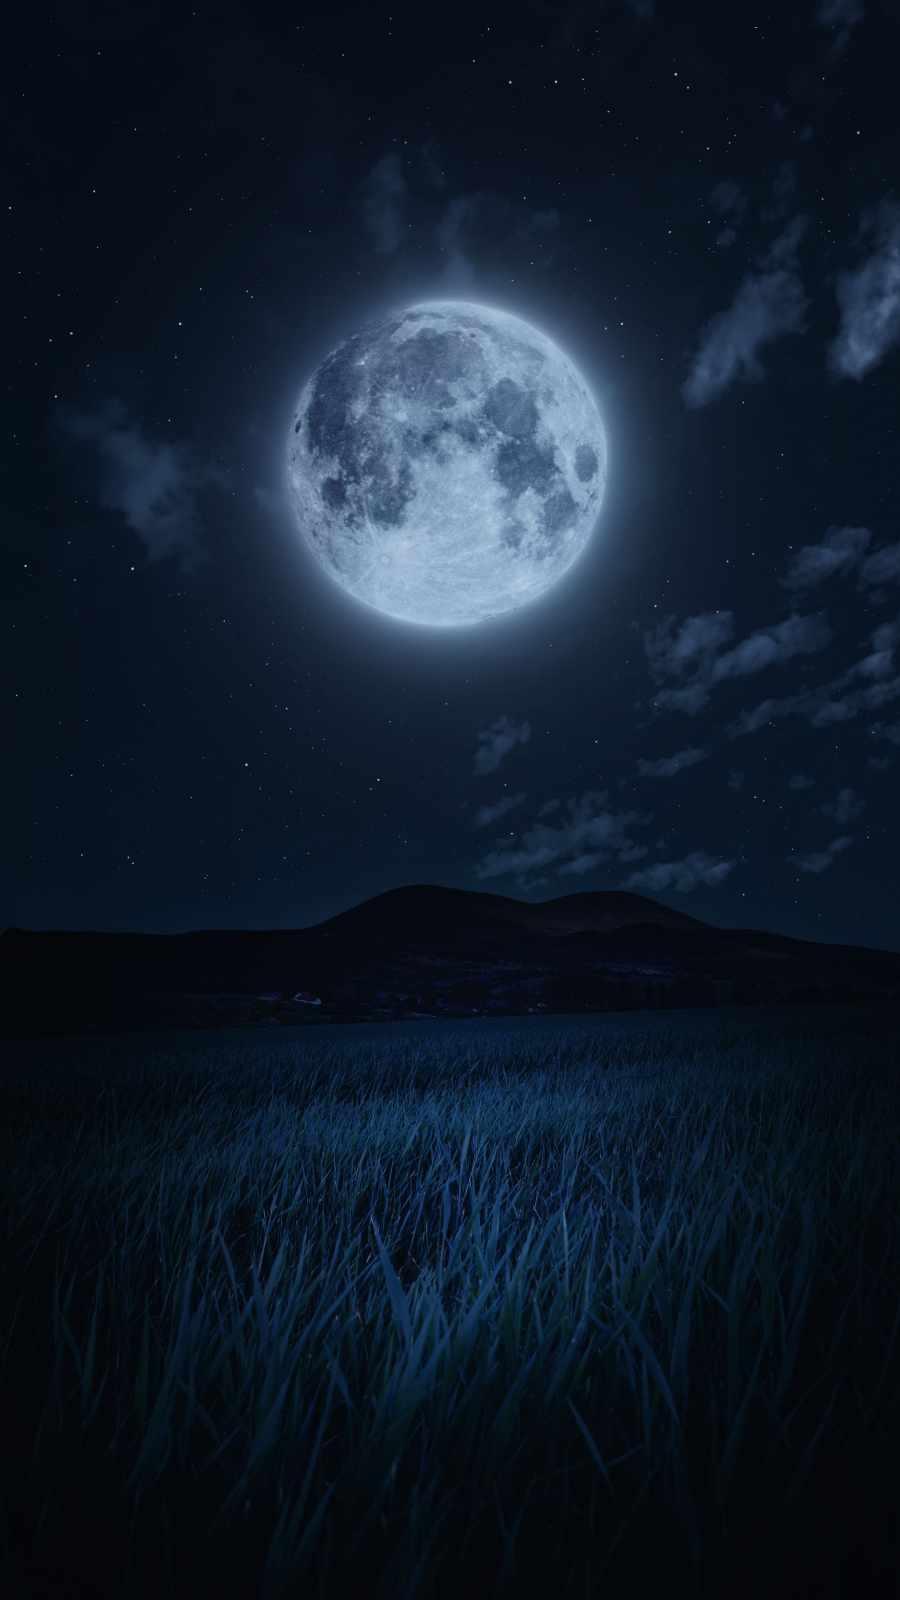 Moonlight in Nature